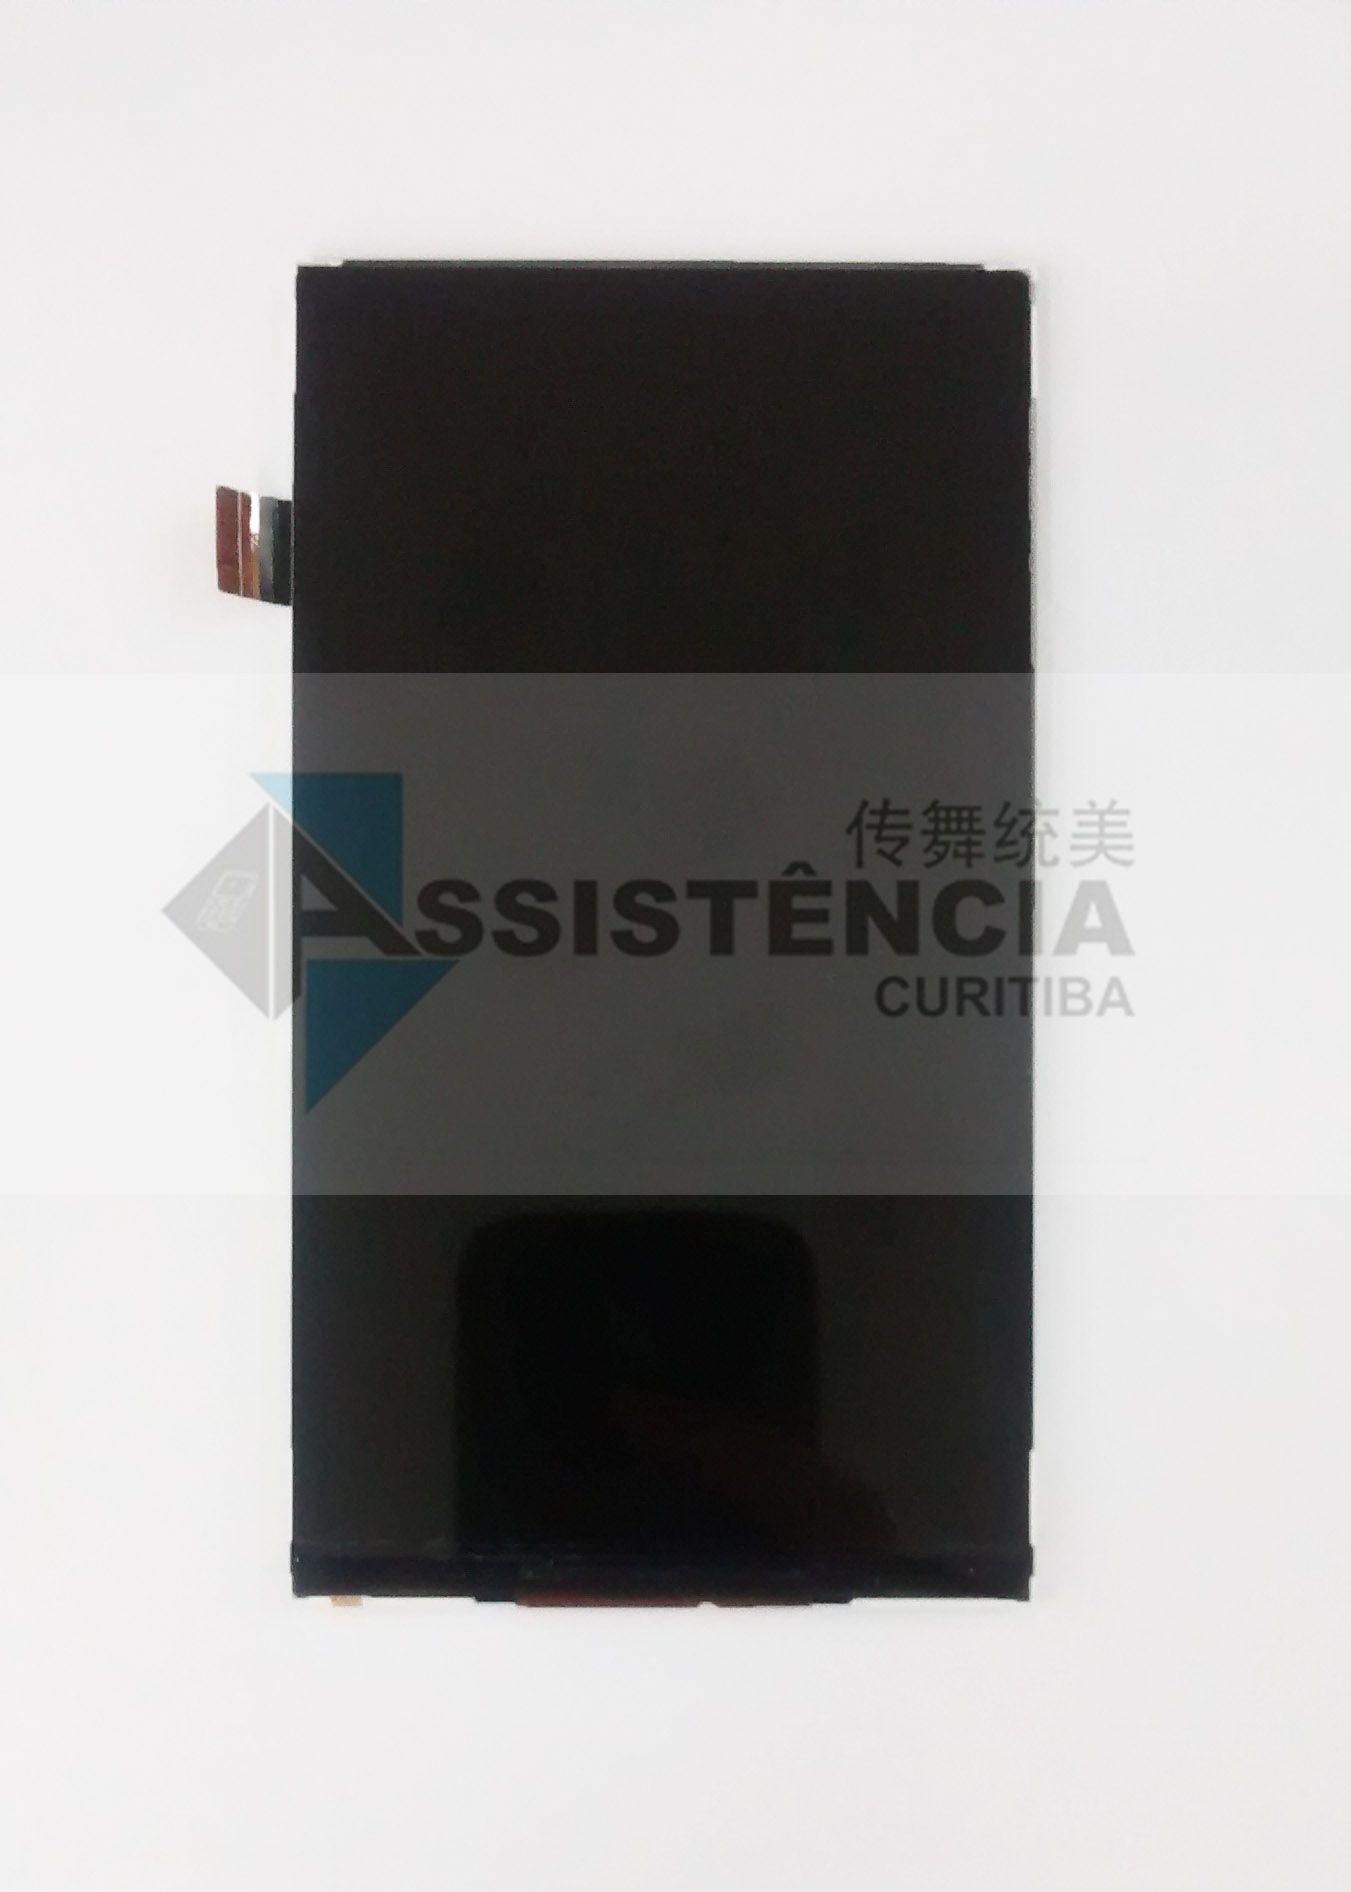 TELA DISPLAY LCD CELULAR ALCATEL ONE TOUCH PIXI 4 5.0 OT5010 5010D 5010G 5010E